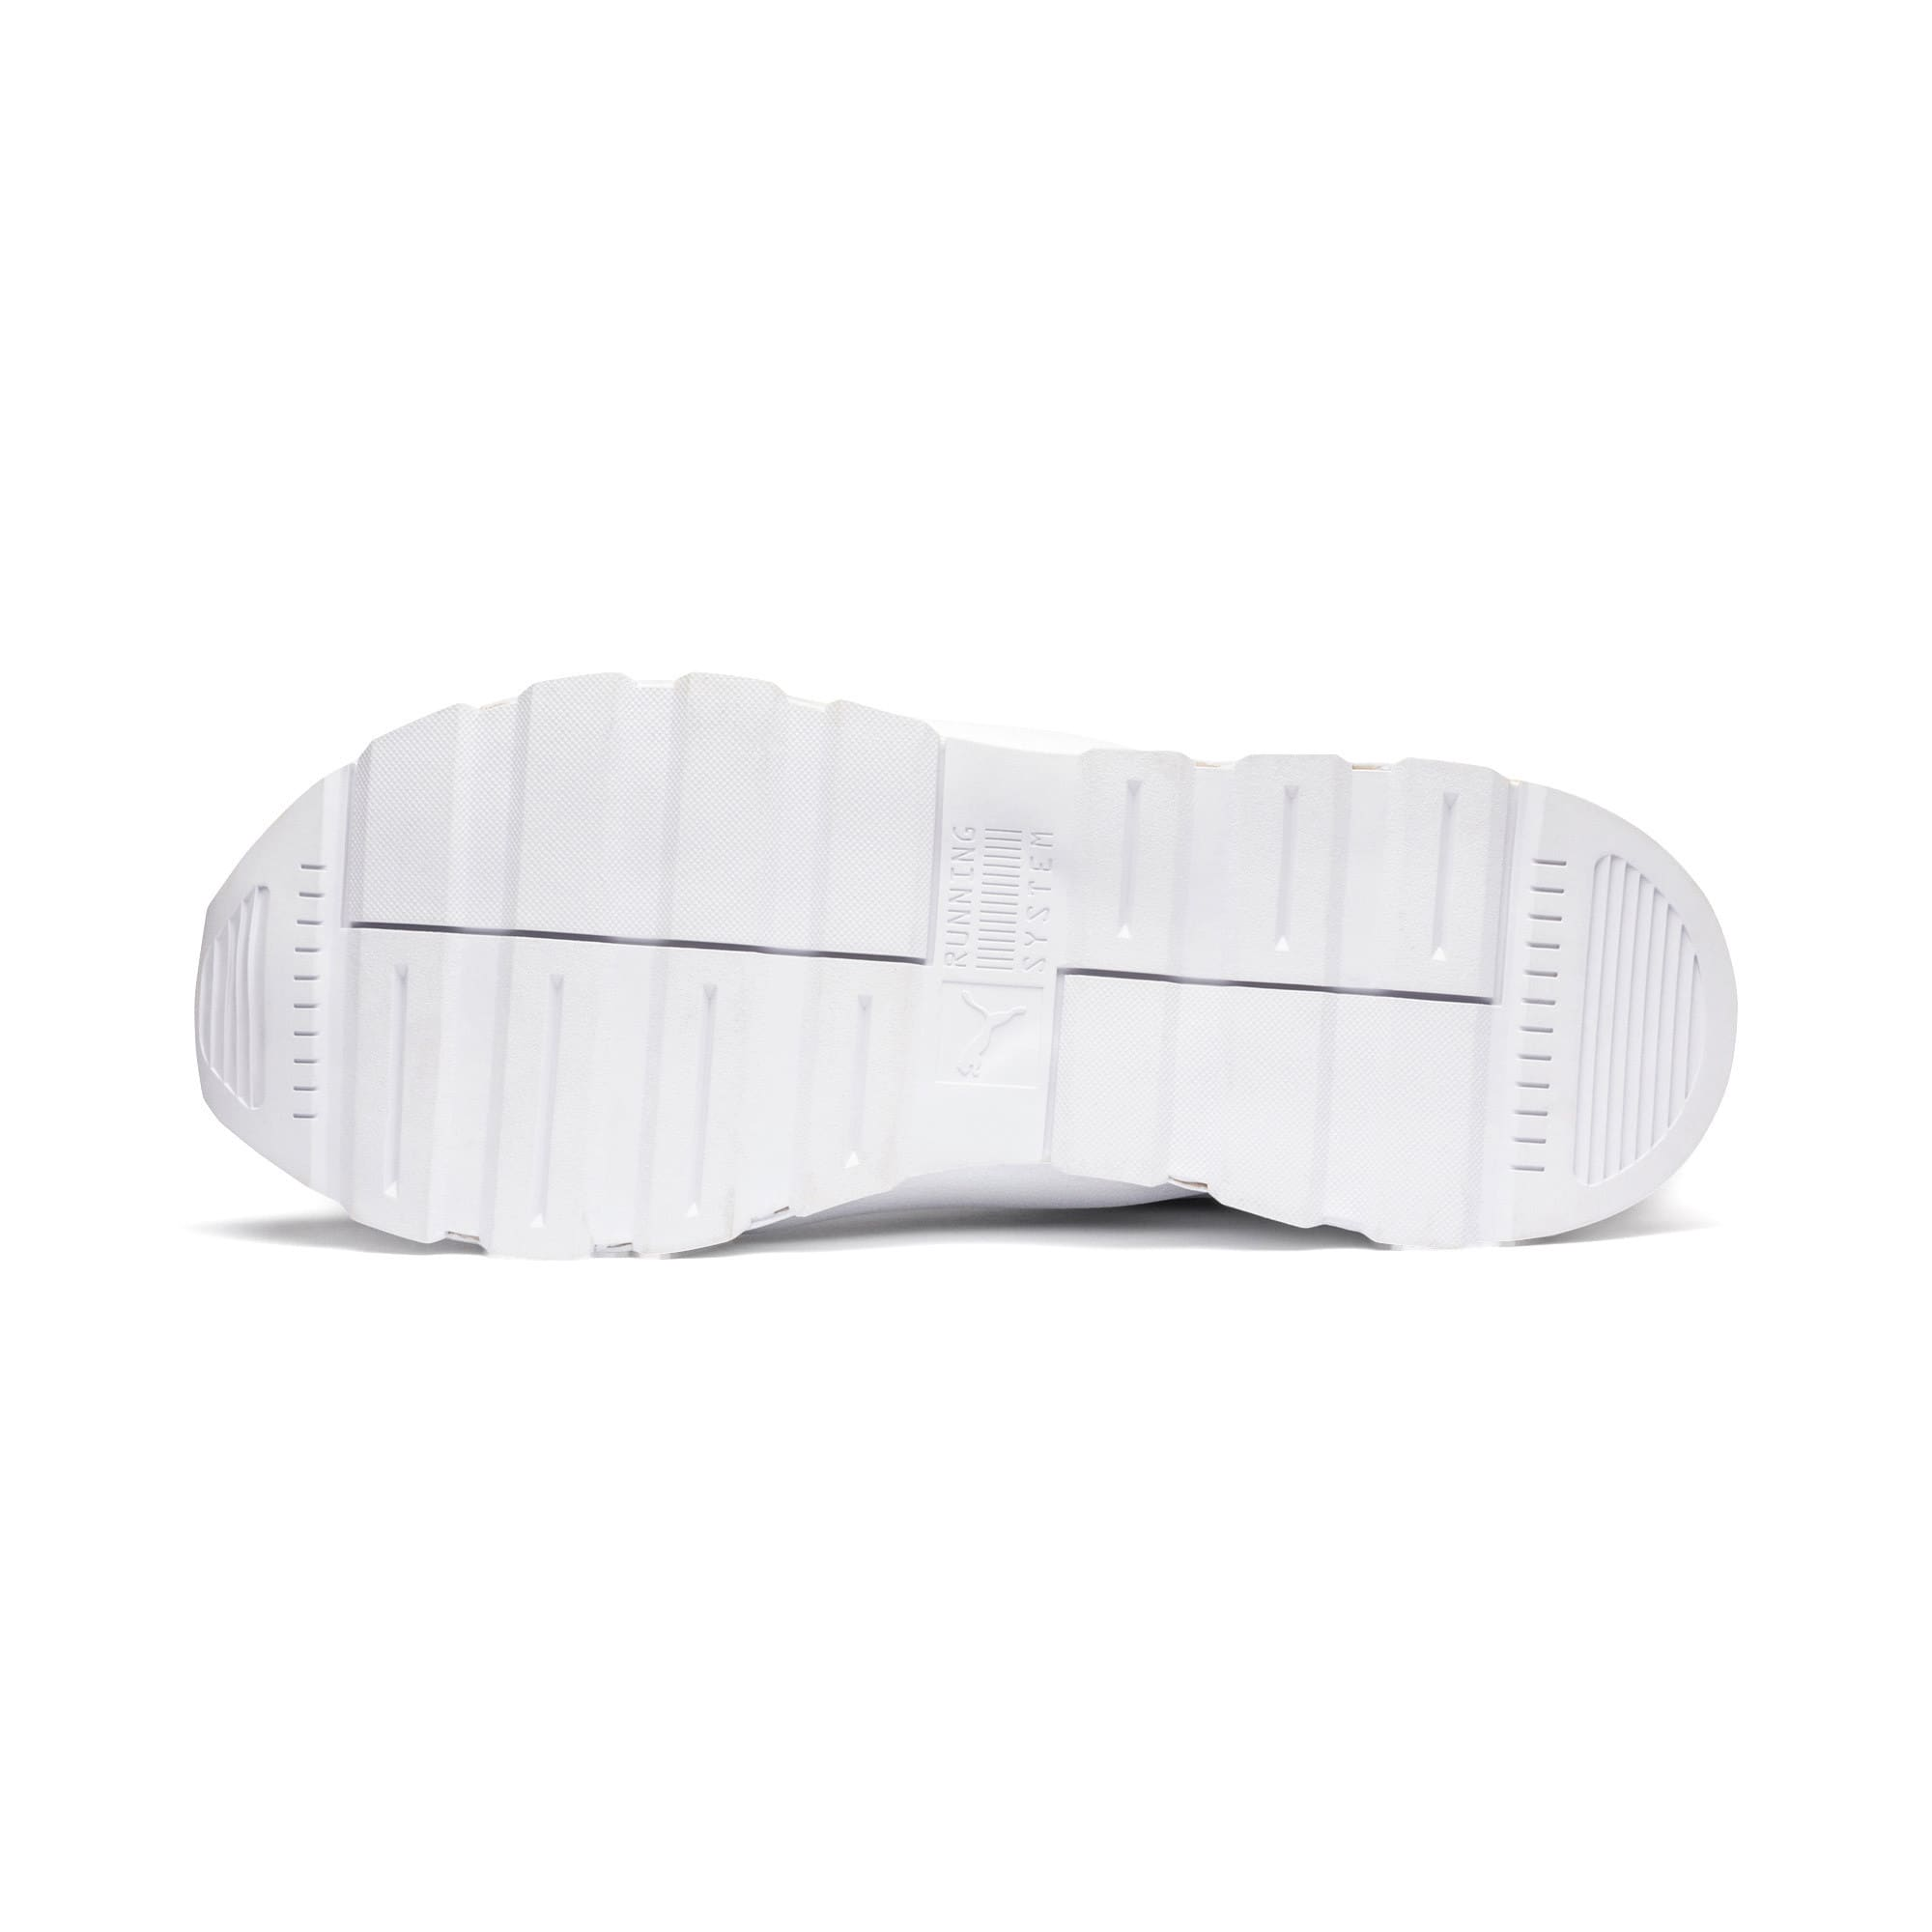 Thumbnail 4 of Evolution RS-0 SOUND sneakers, Puma White, medium